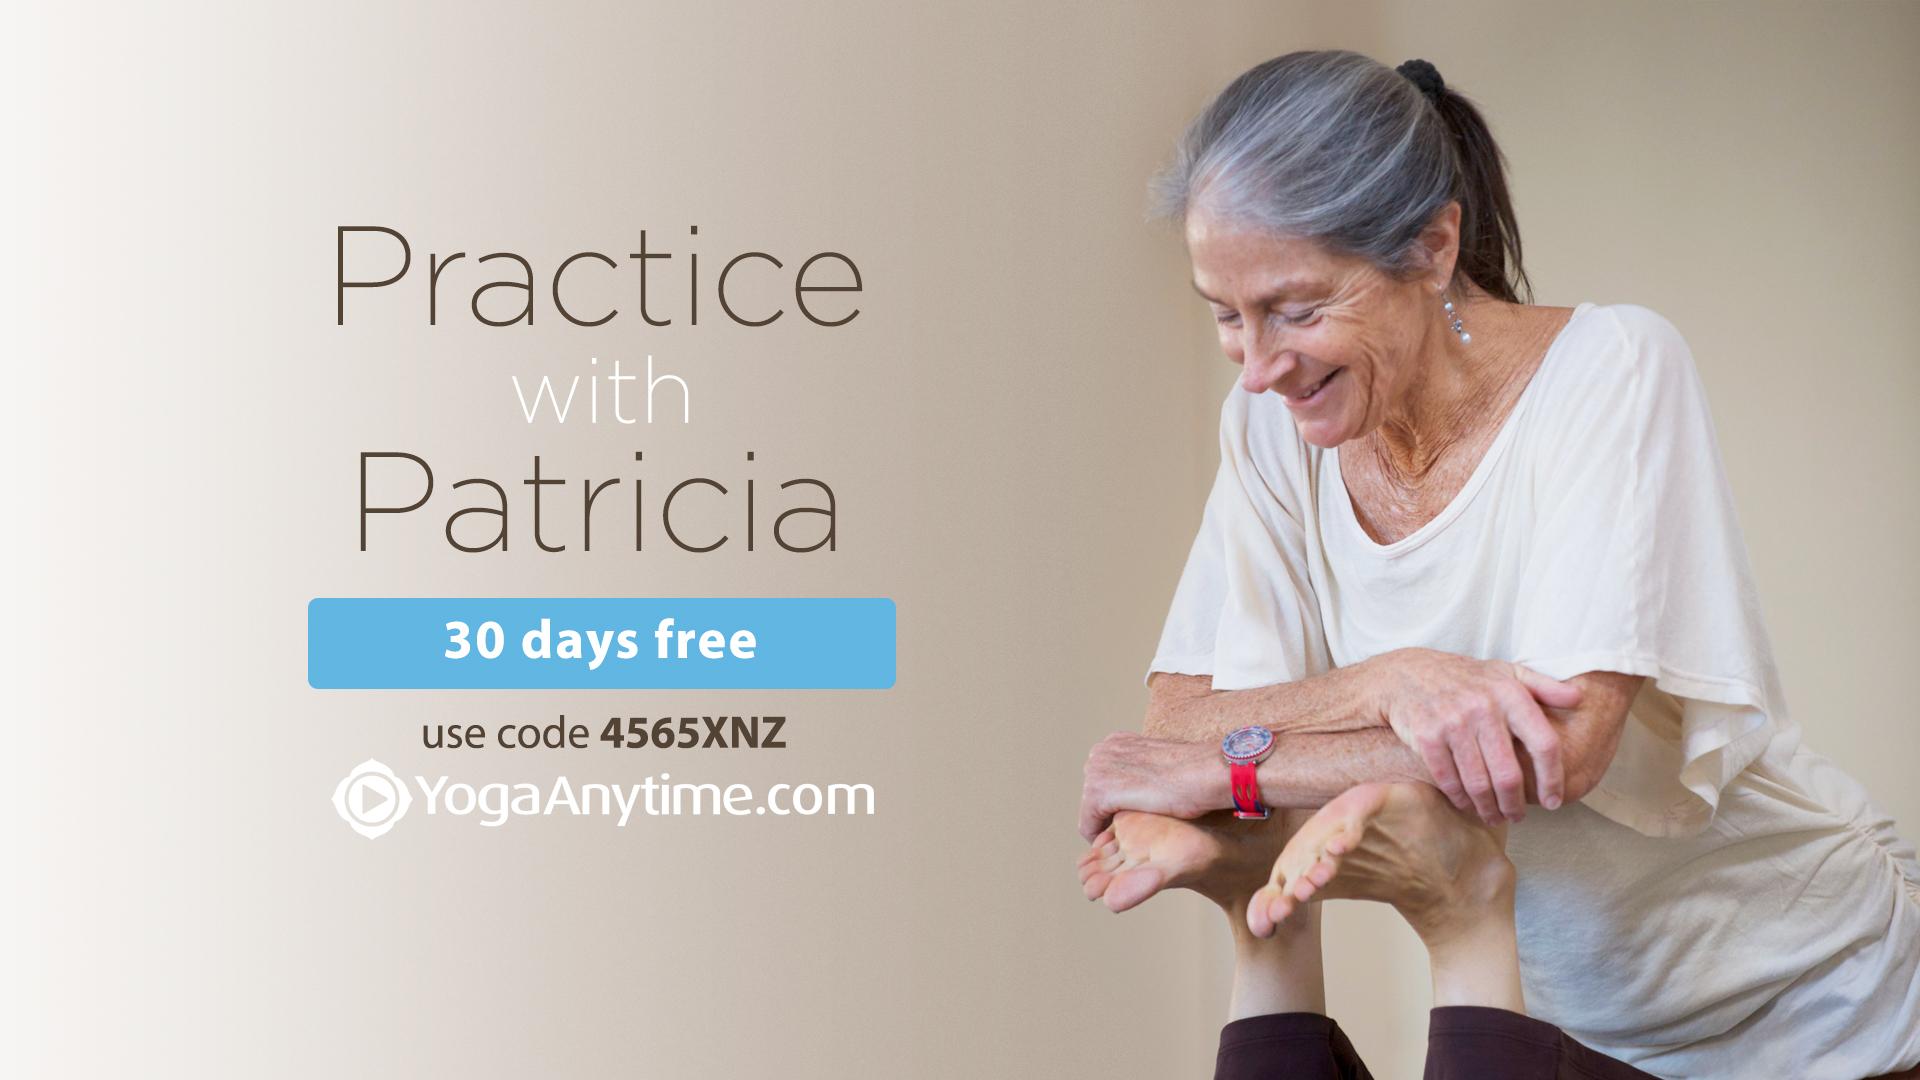 PracticewPatricia_facebookpost